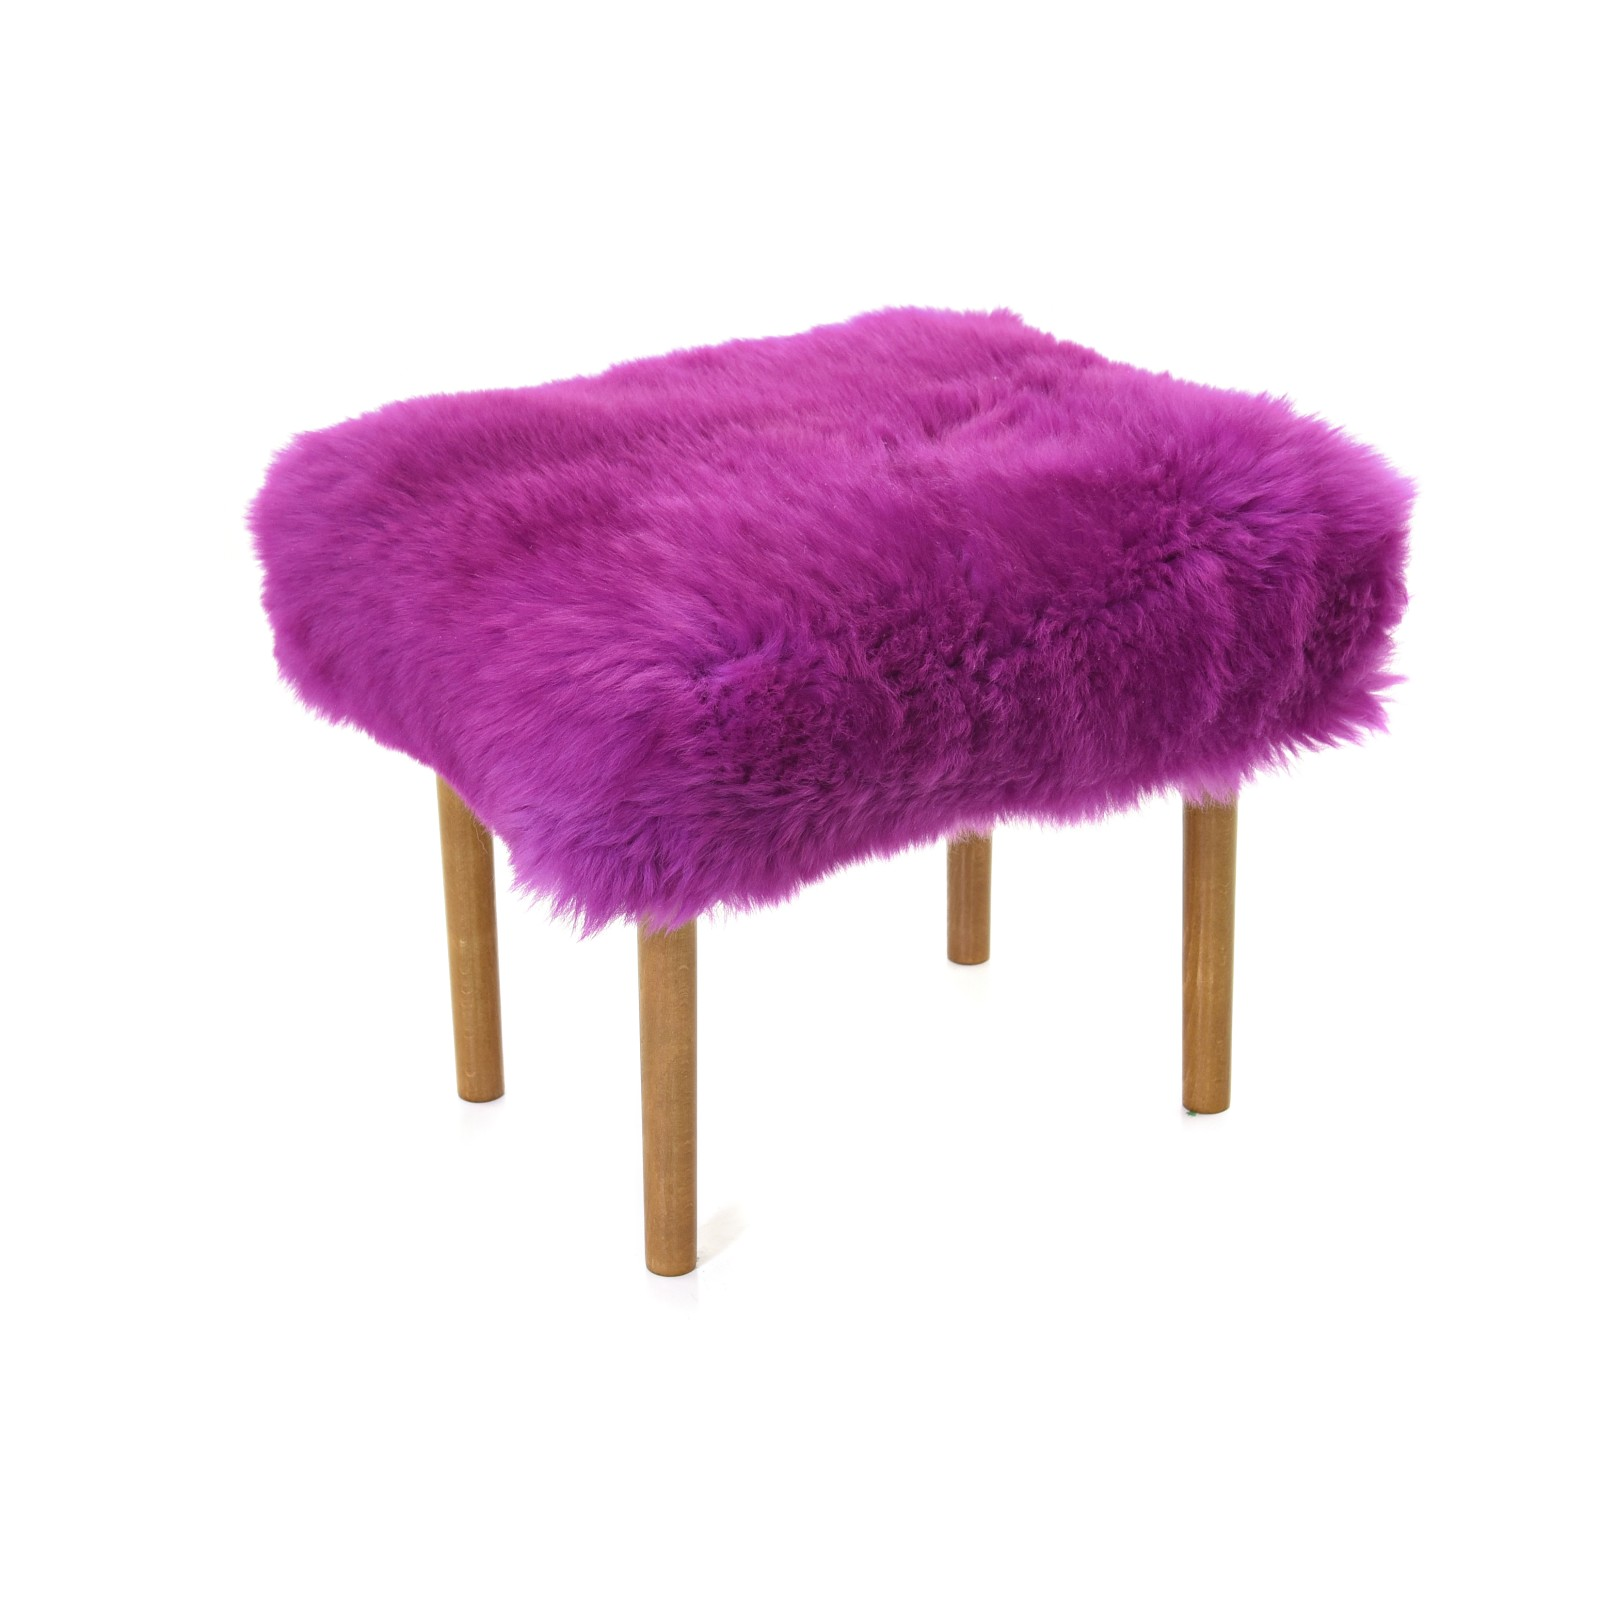 Ceri Sheepskin Footstool Cerise